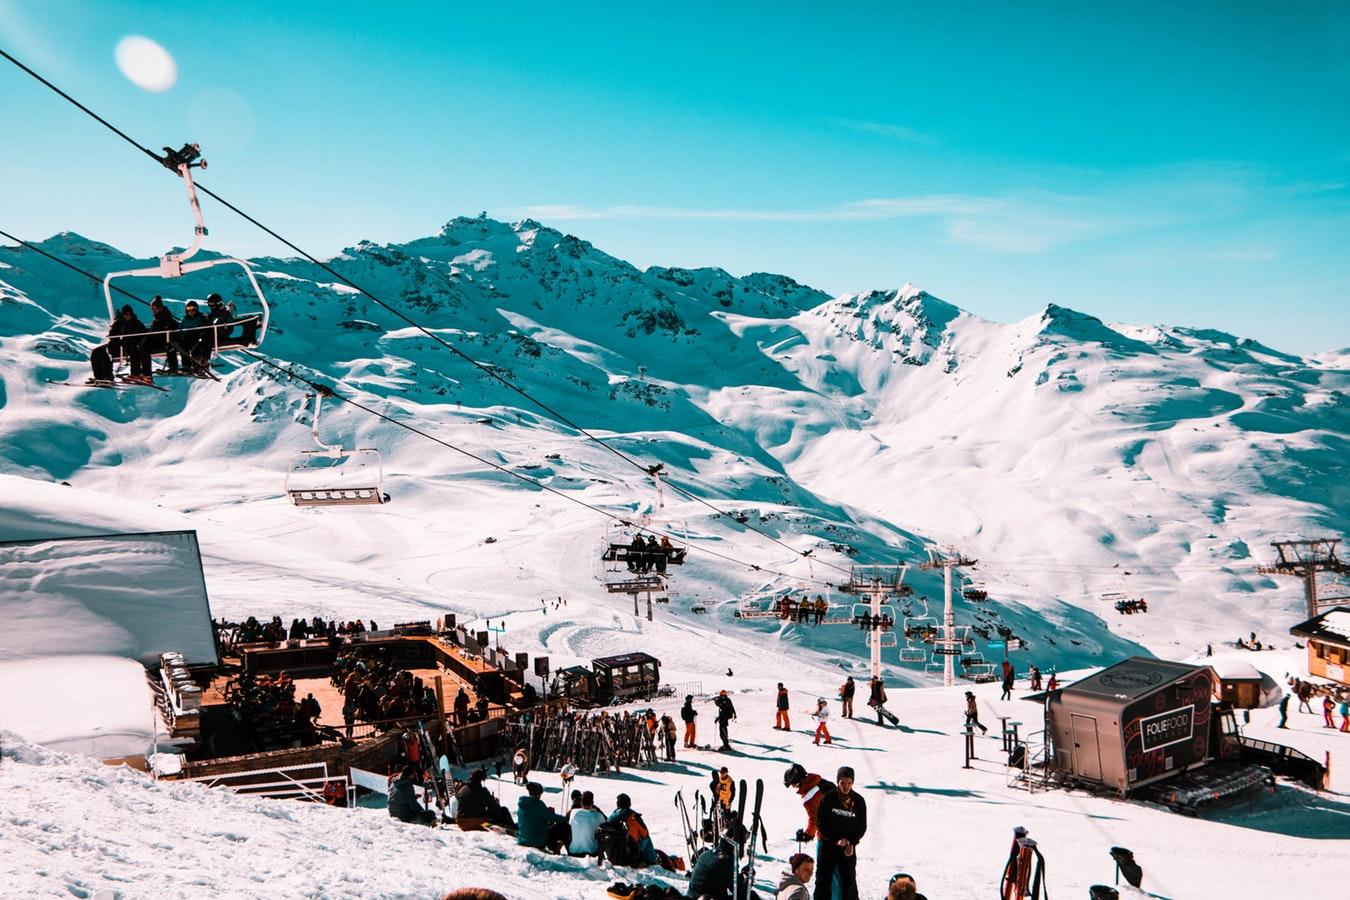 photo 1519659675643 e5885721661f 2 - Kolory tras narciarskich. Na co zwrócić uwagę na nartach, czyli savoir vivre na stoku.